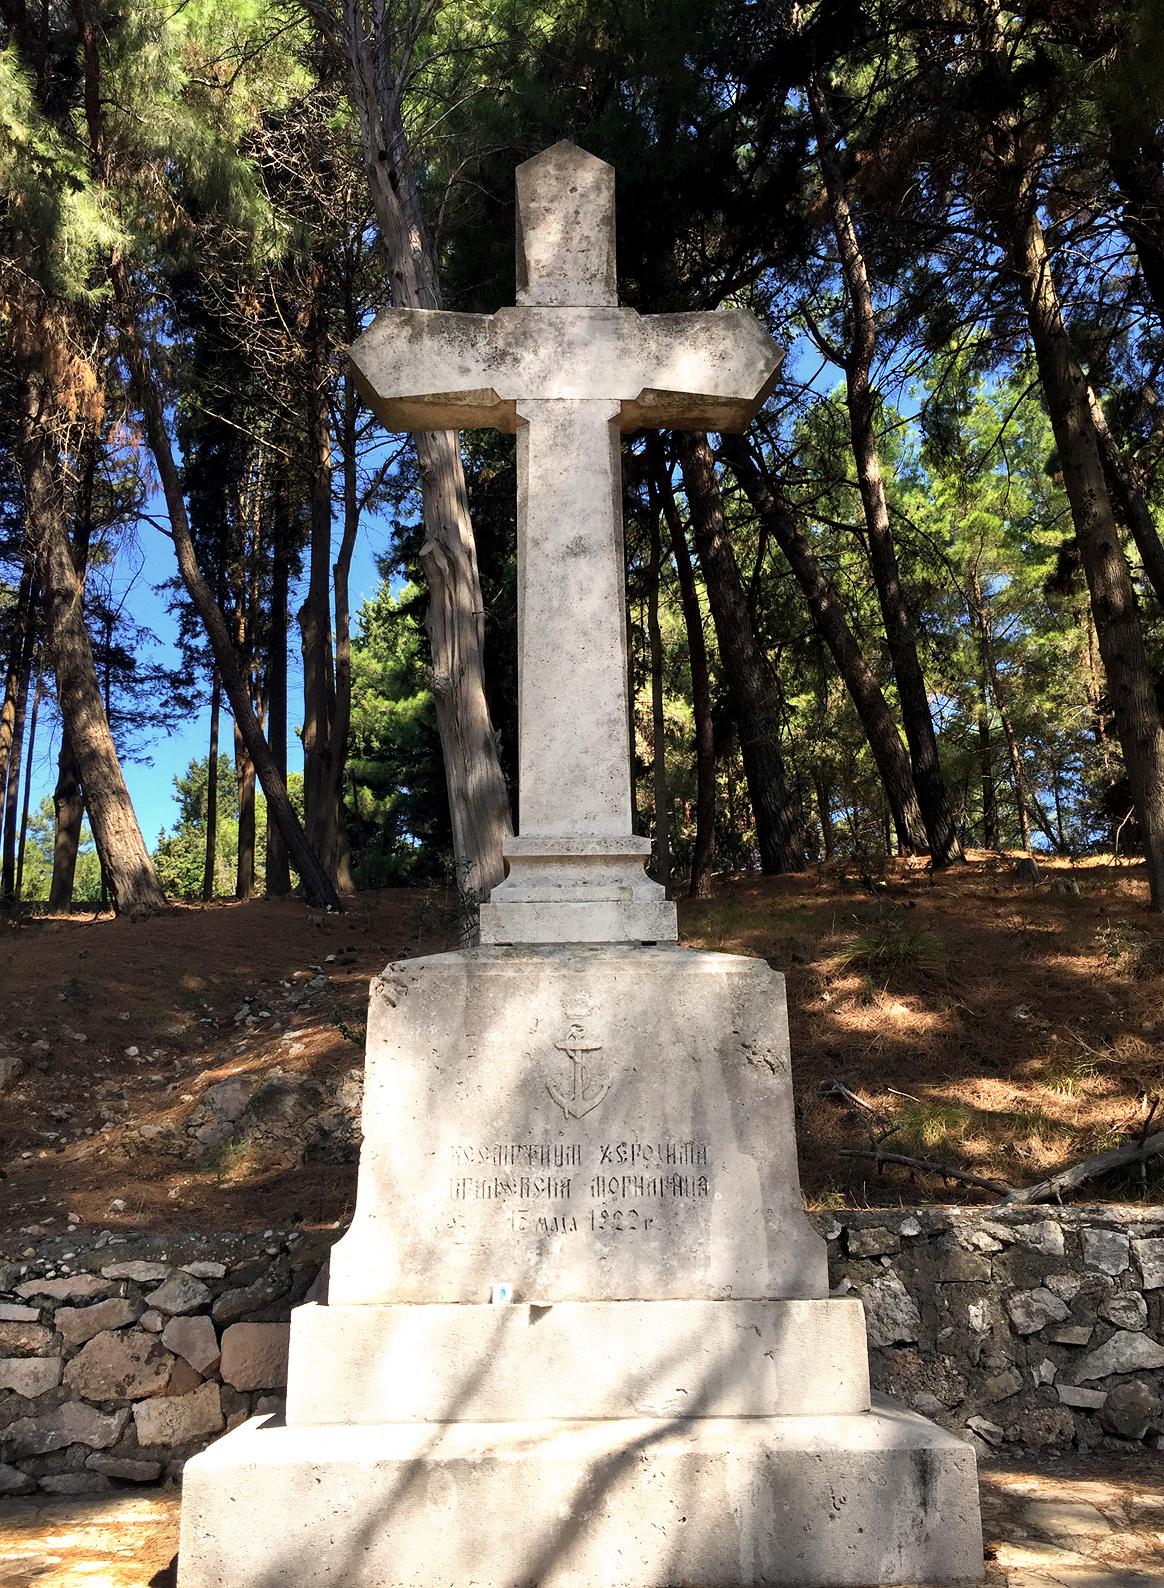 Spomenik na ostrvu Vido iz 1922: Besmrtnim herojima, Kraljevska mornarica 17. maja 1922